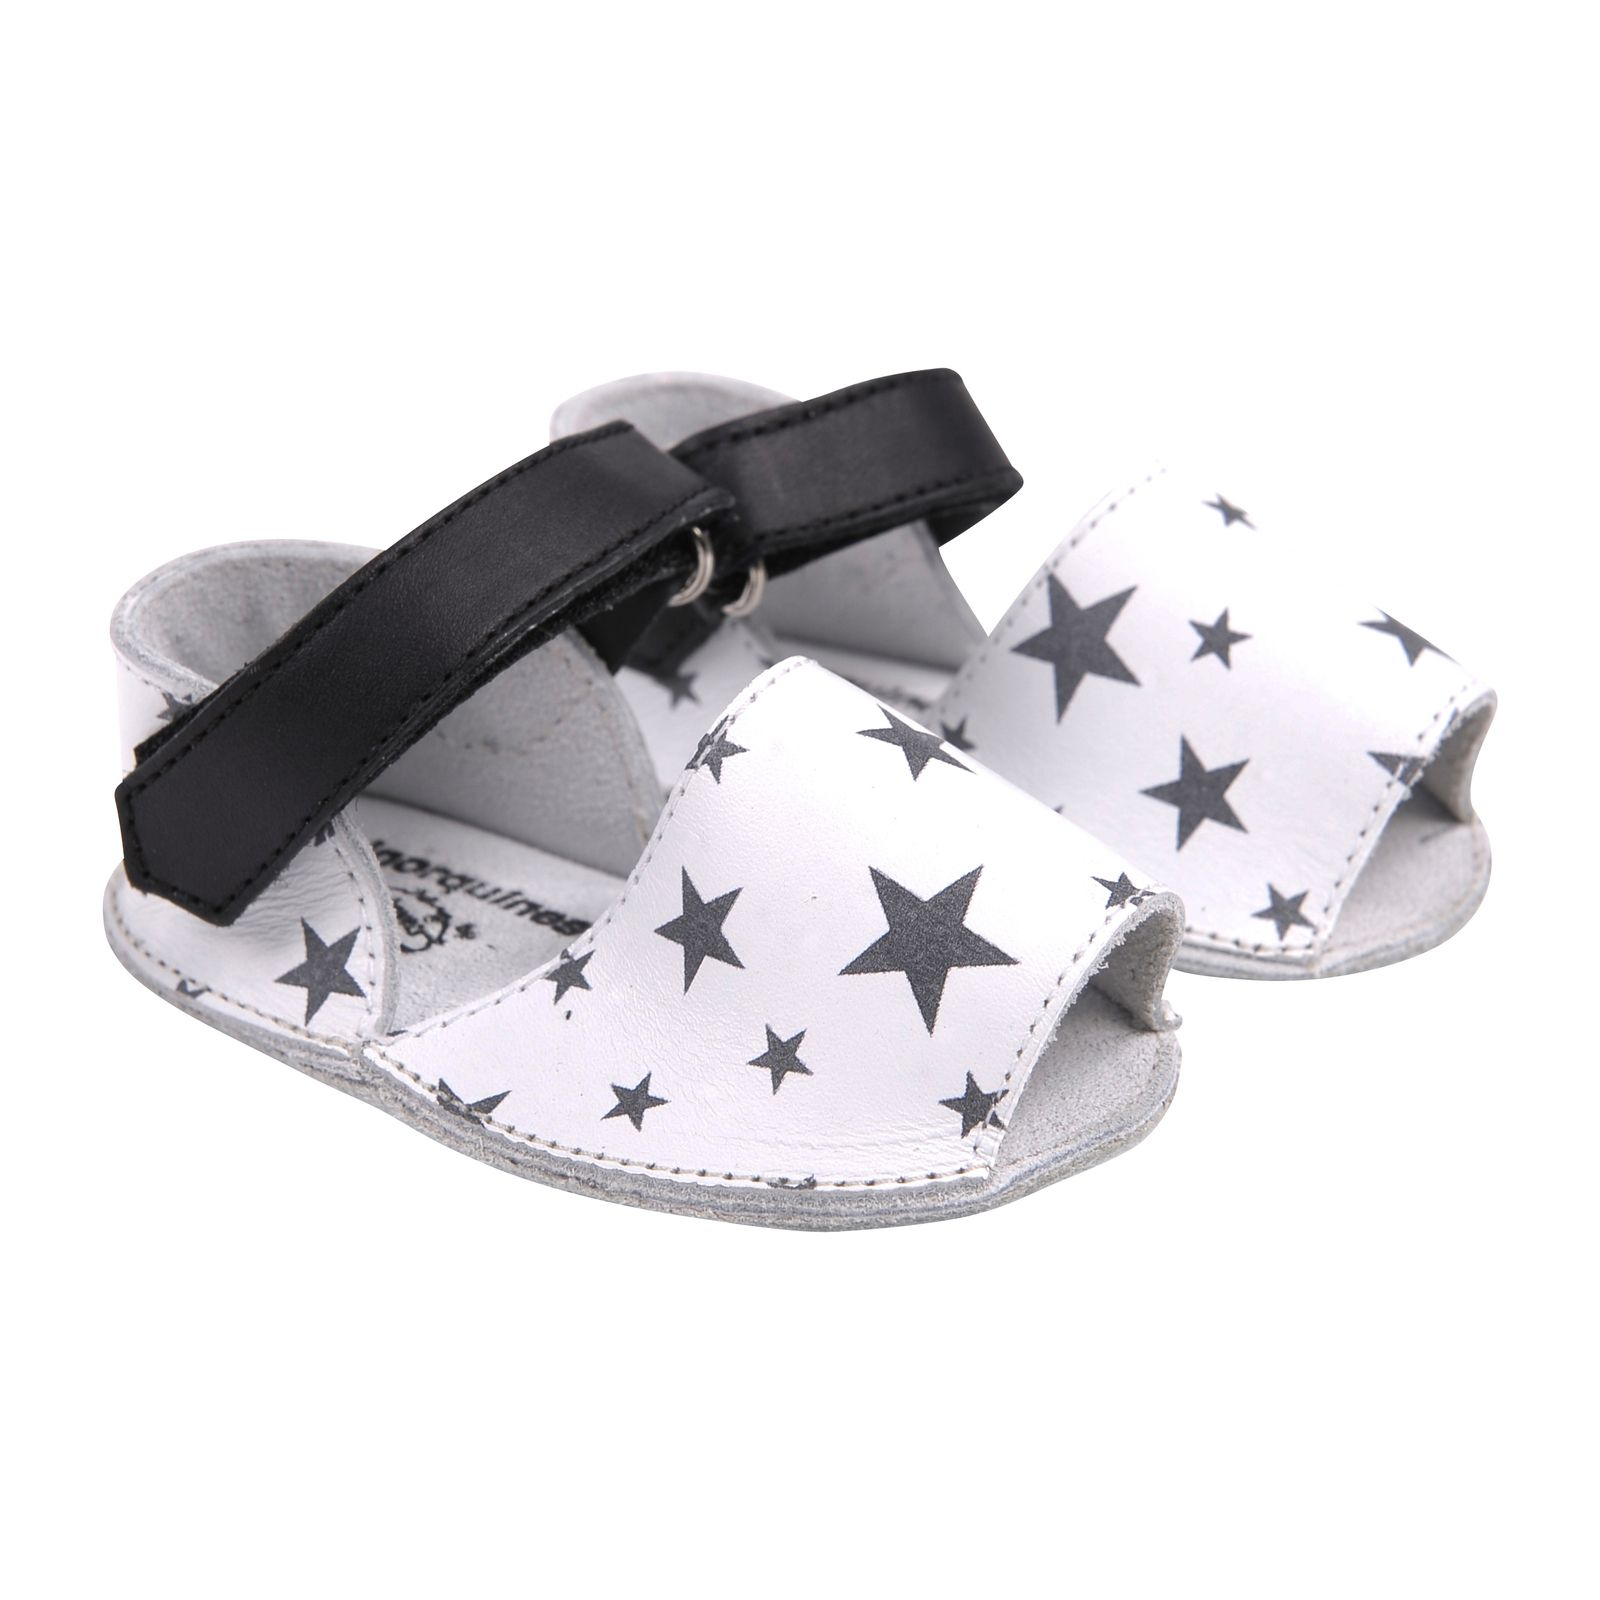 Frailera Baby shoes Star